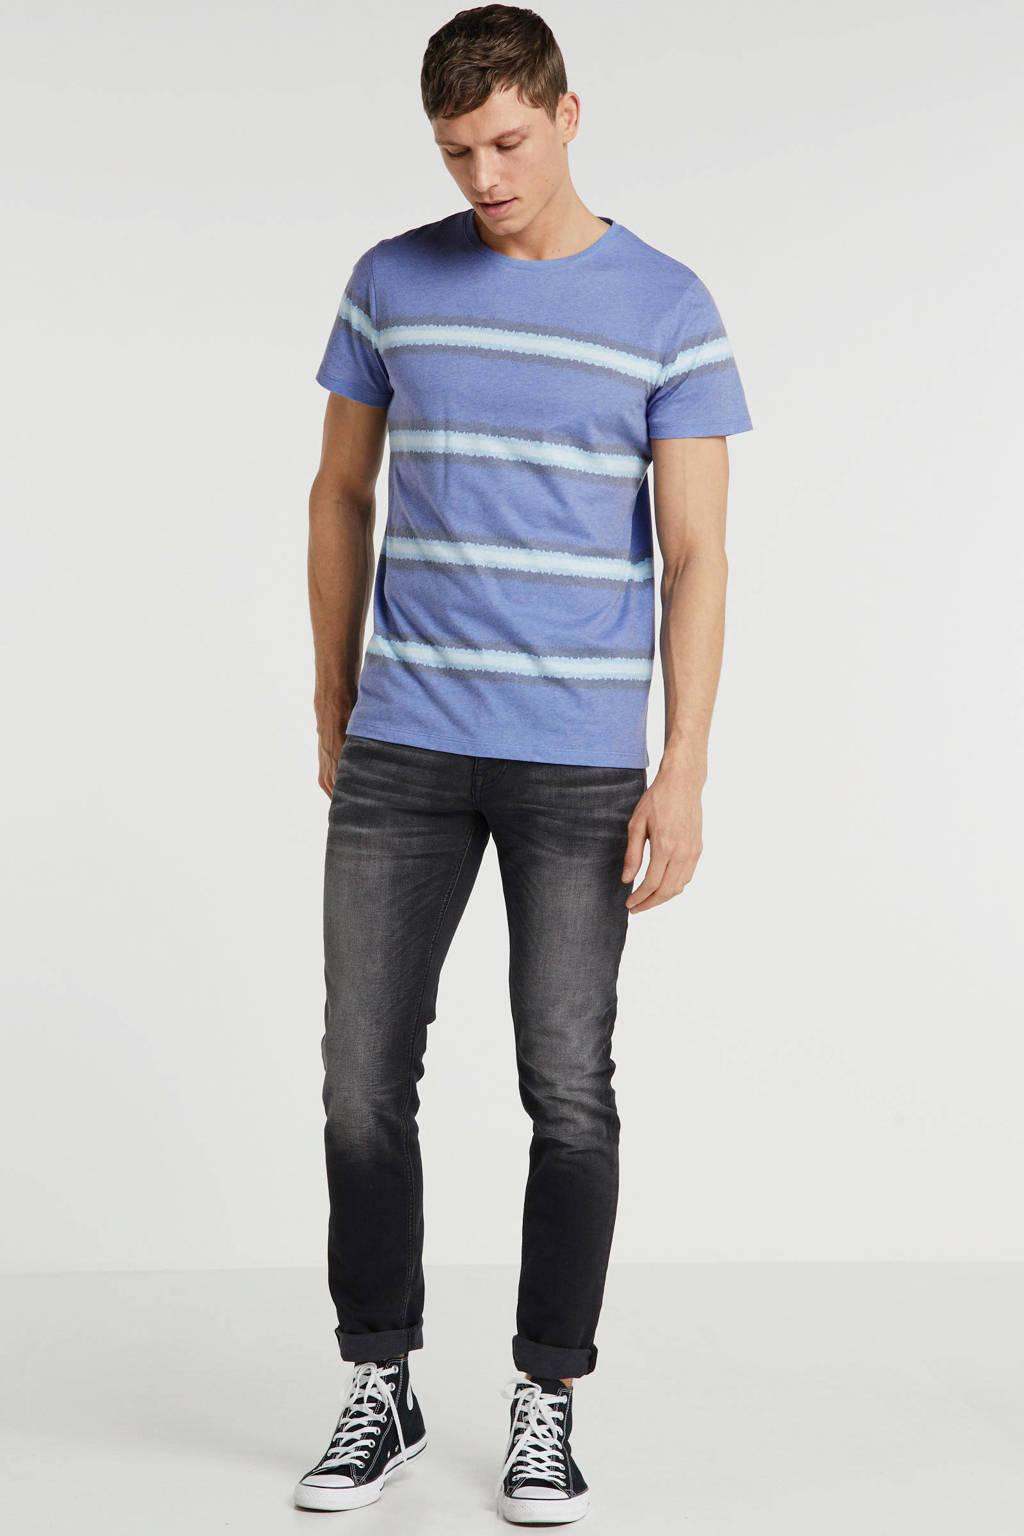 Redefined Rebel gestreept T-shirt blauw, Blauw